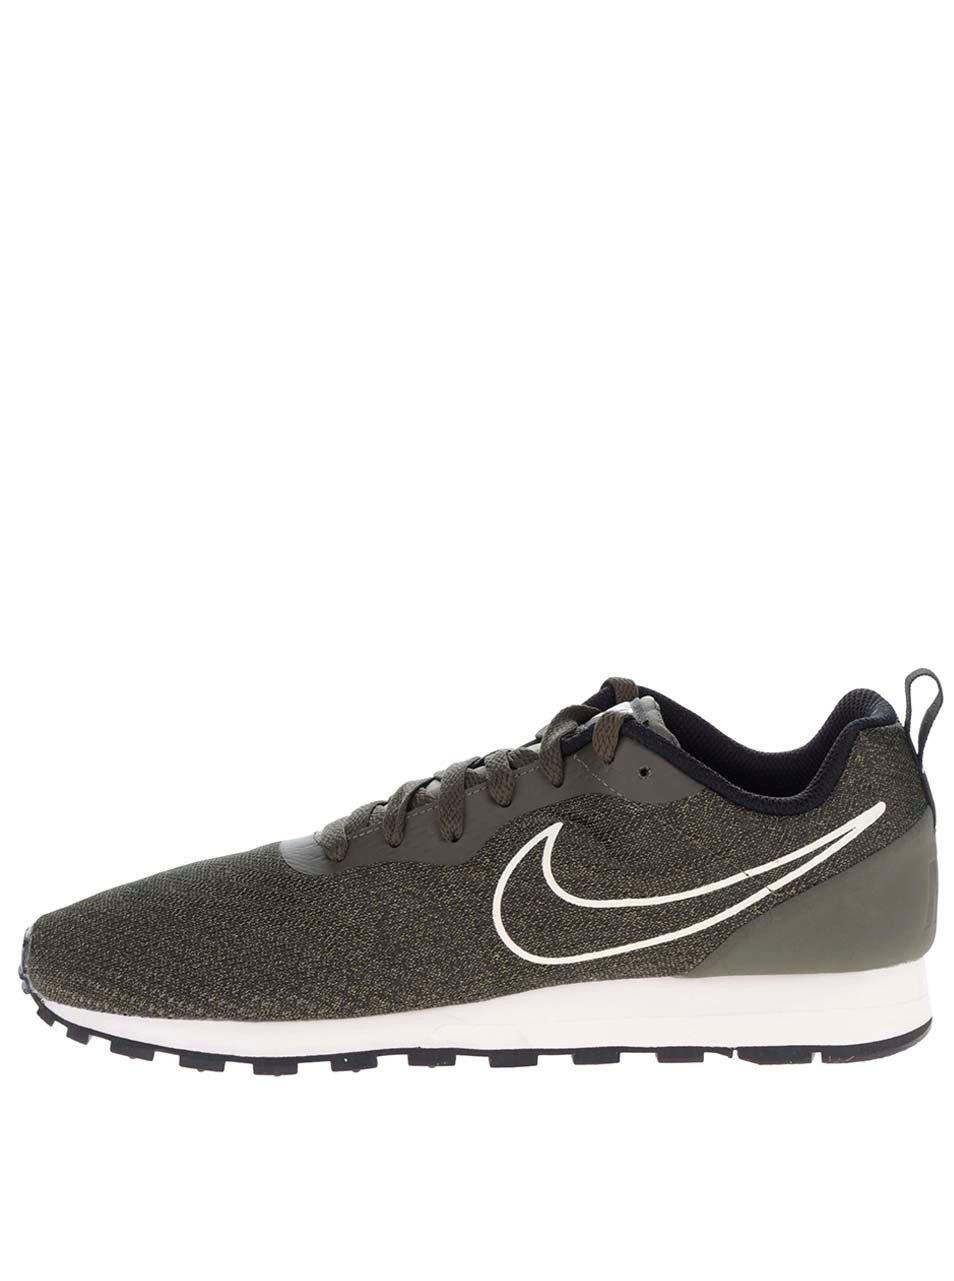 Zelené pánske tenisky Nike MD runner 2 ... 8f68fd33610